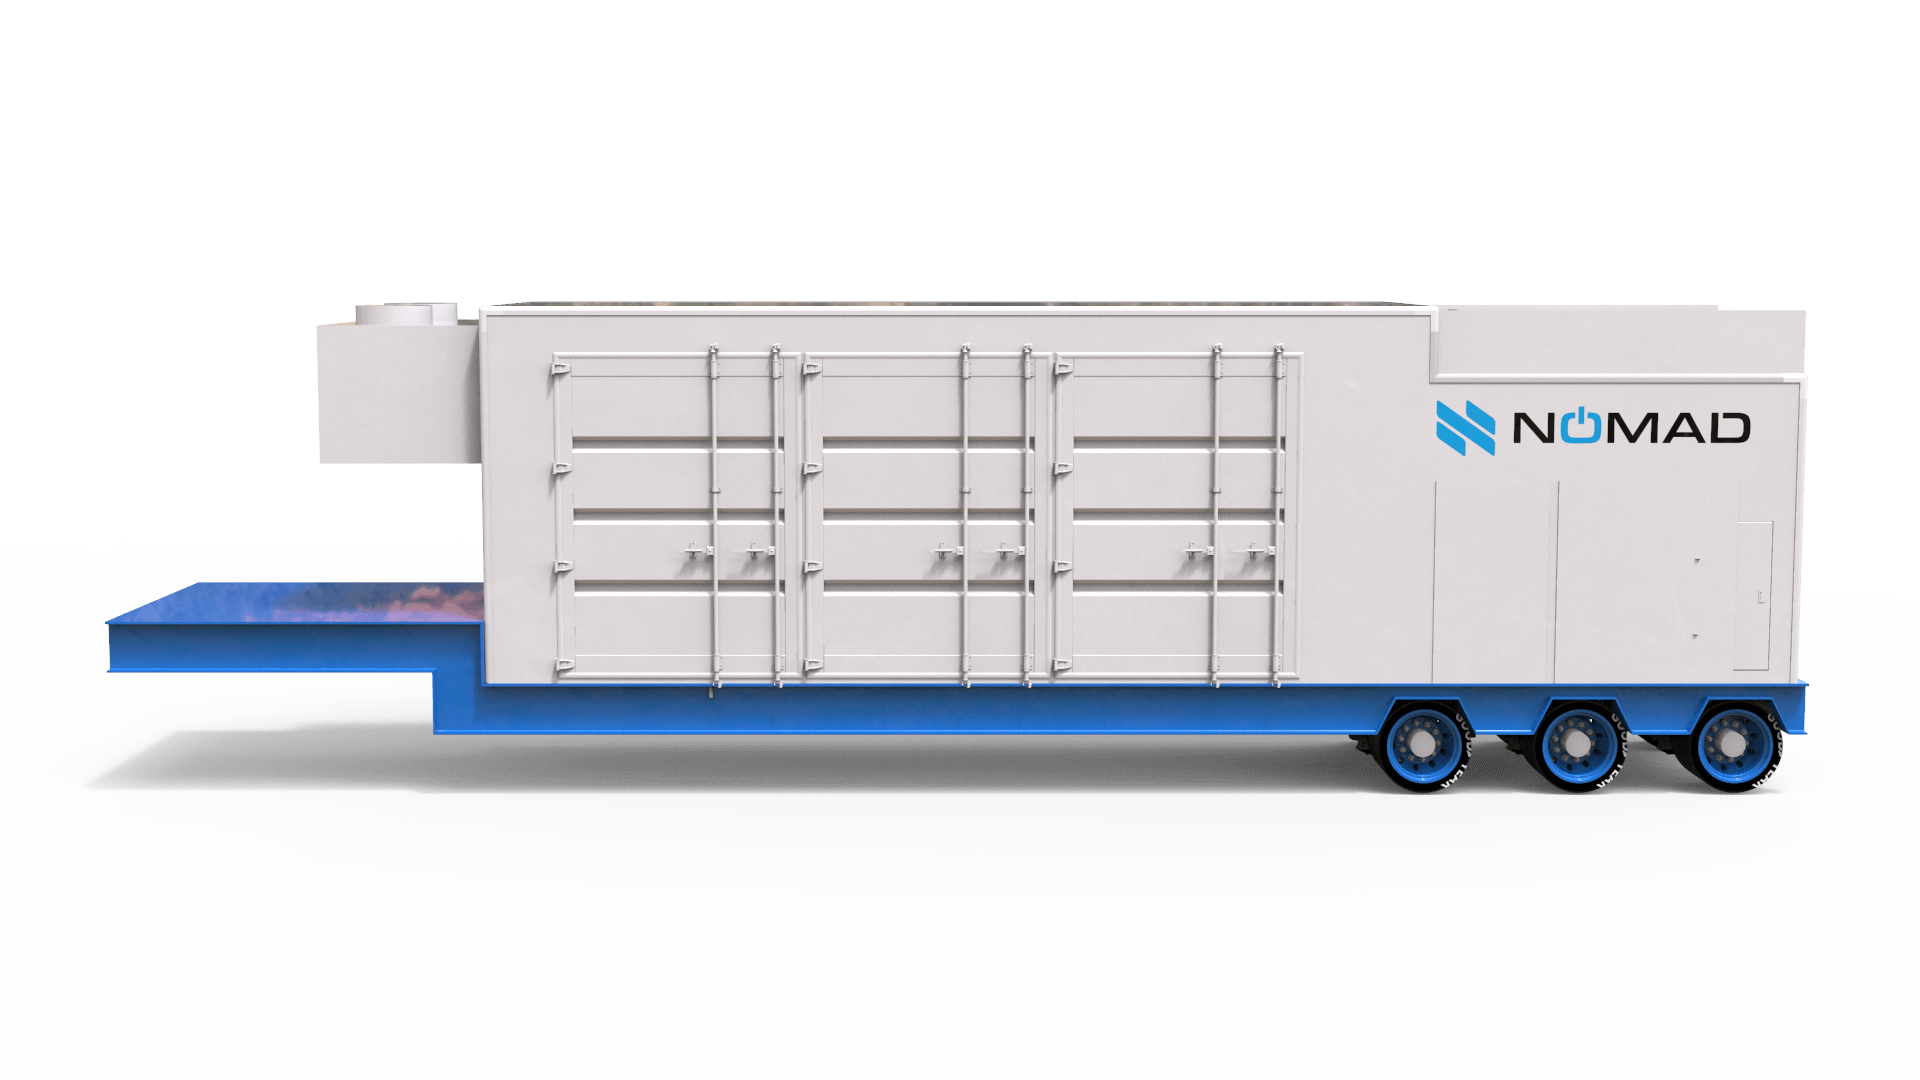 200-KW-Nomad-Closed-V2.222